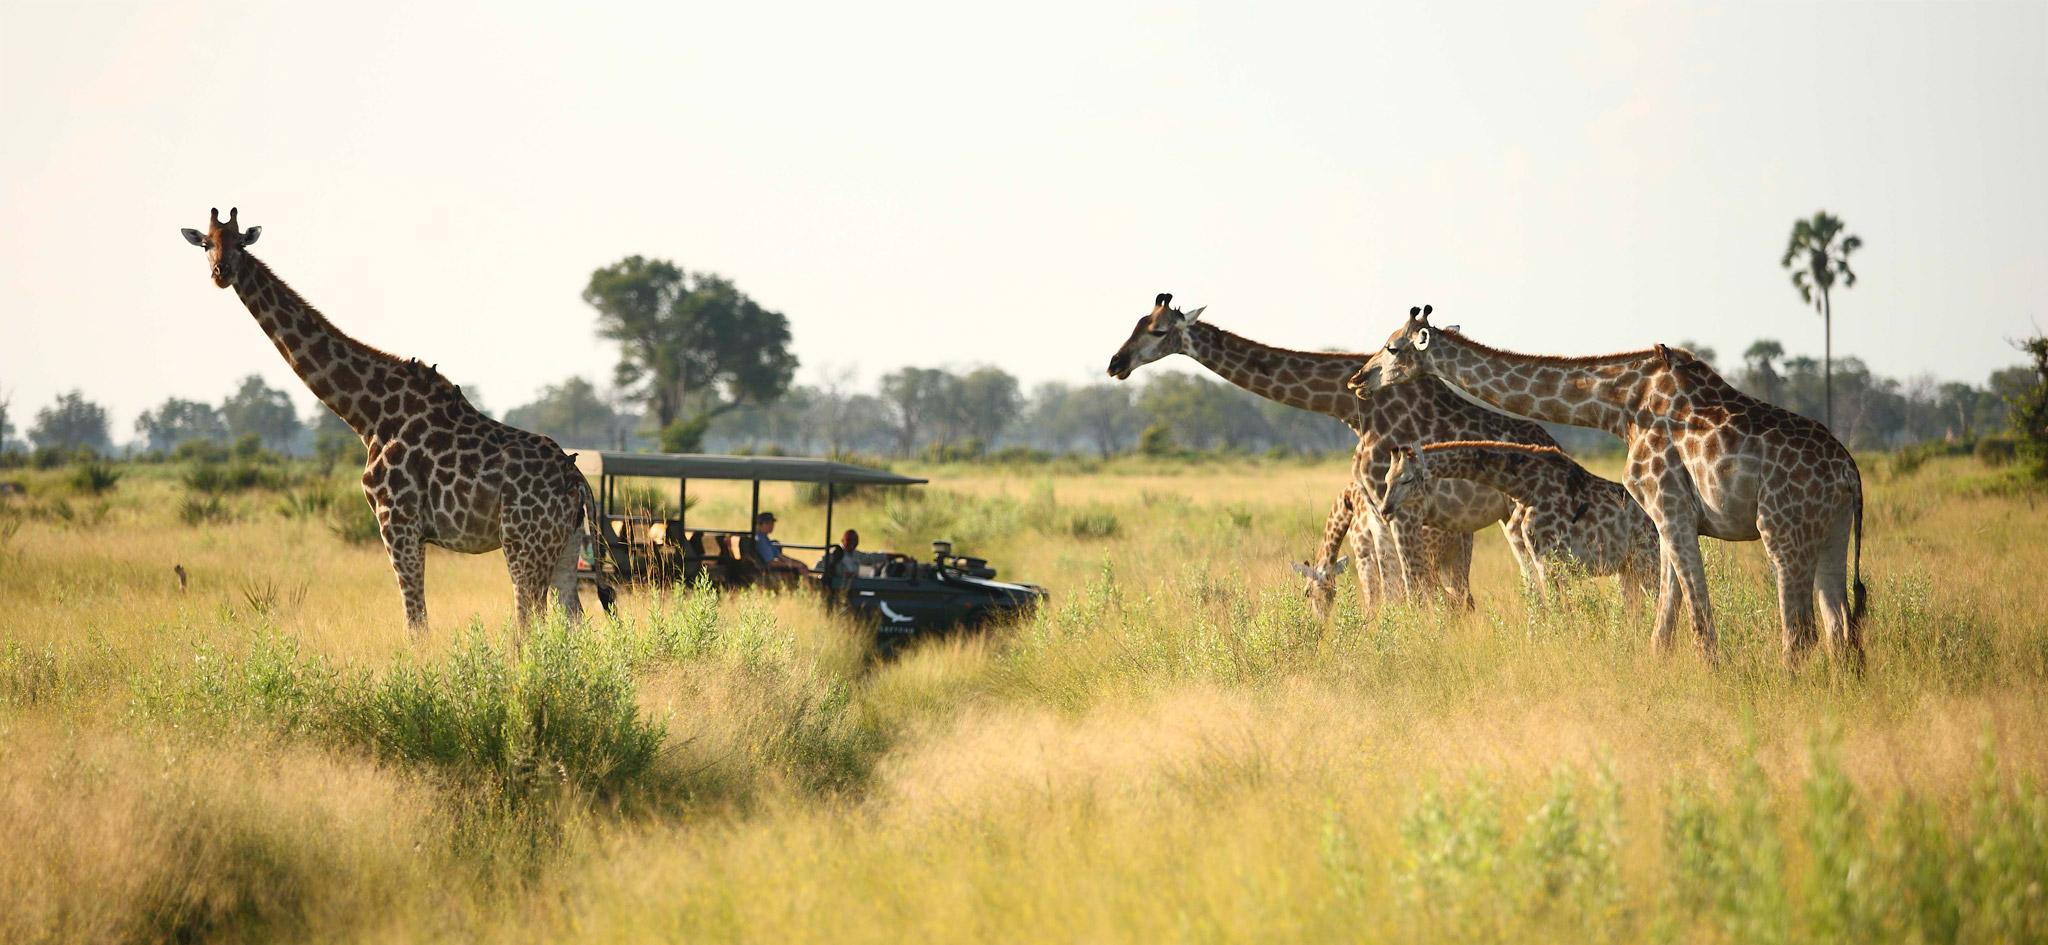 game-drive-with-five-giraffe